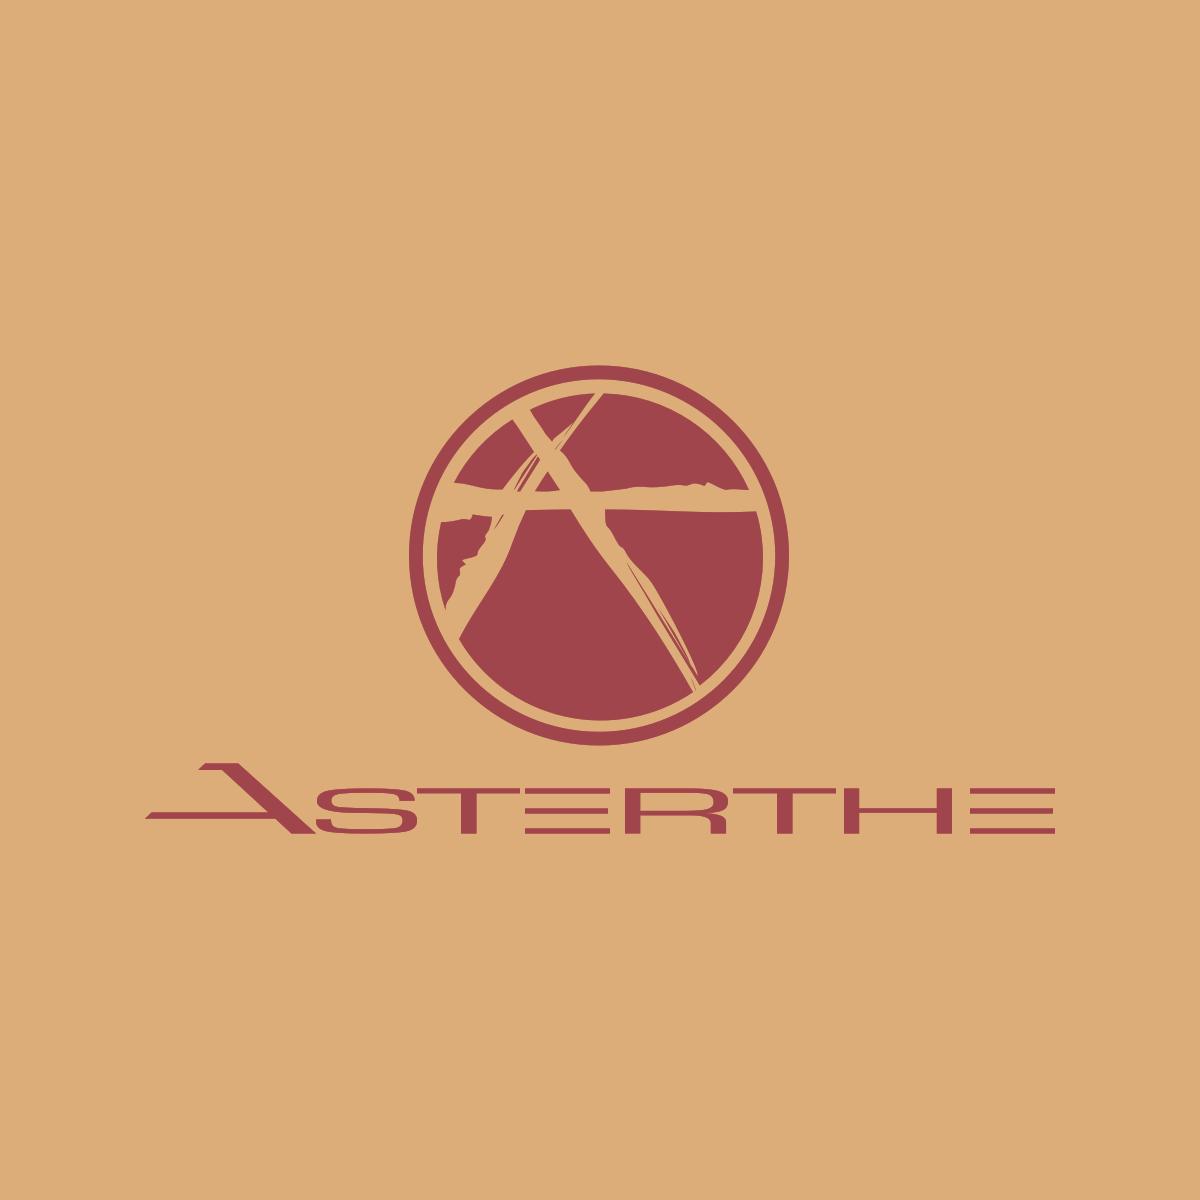 Asterthe_1200x1200